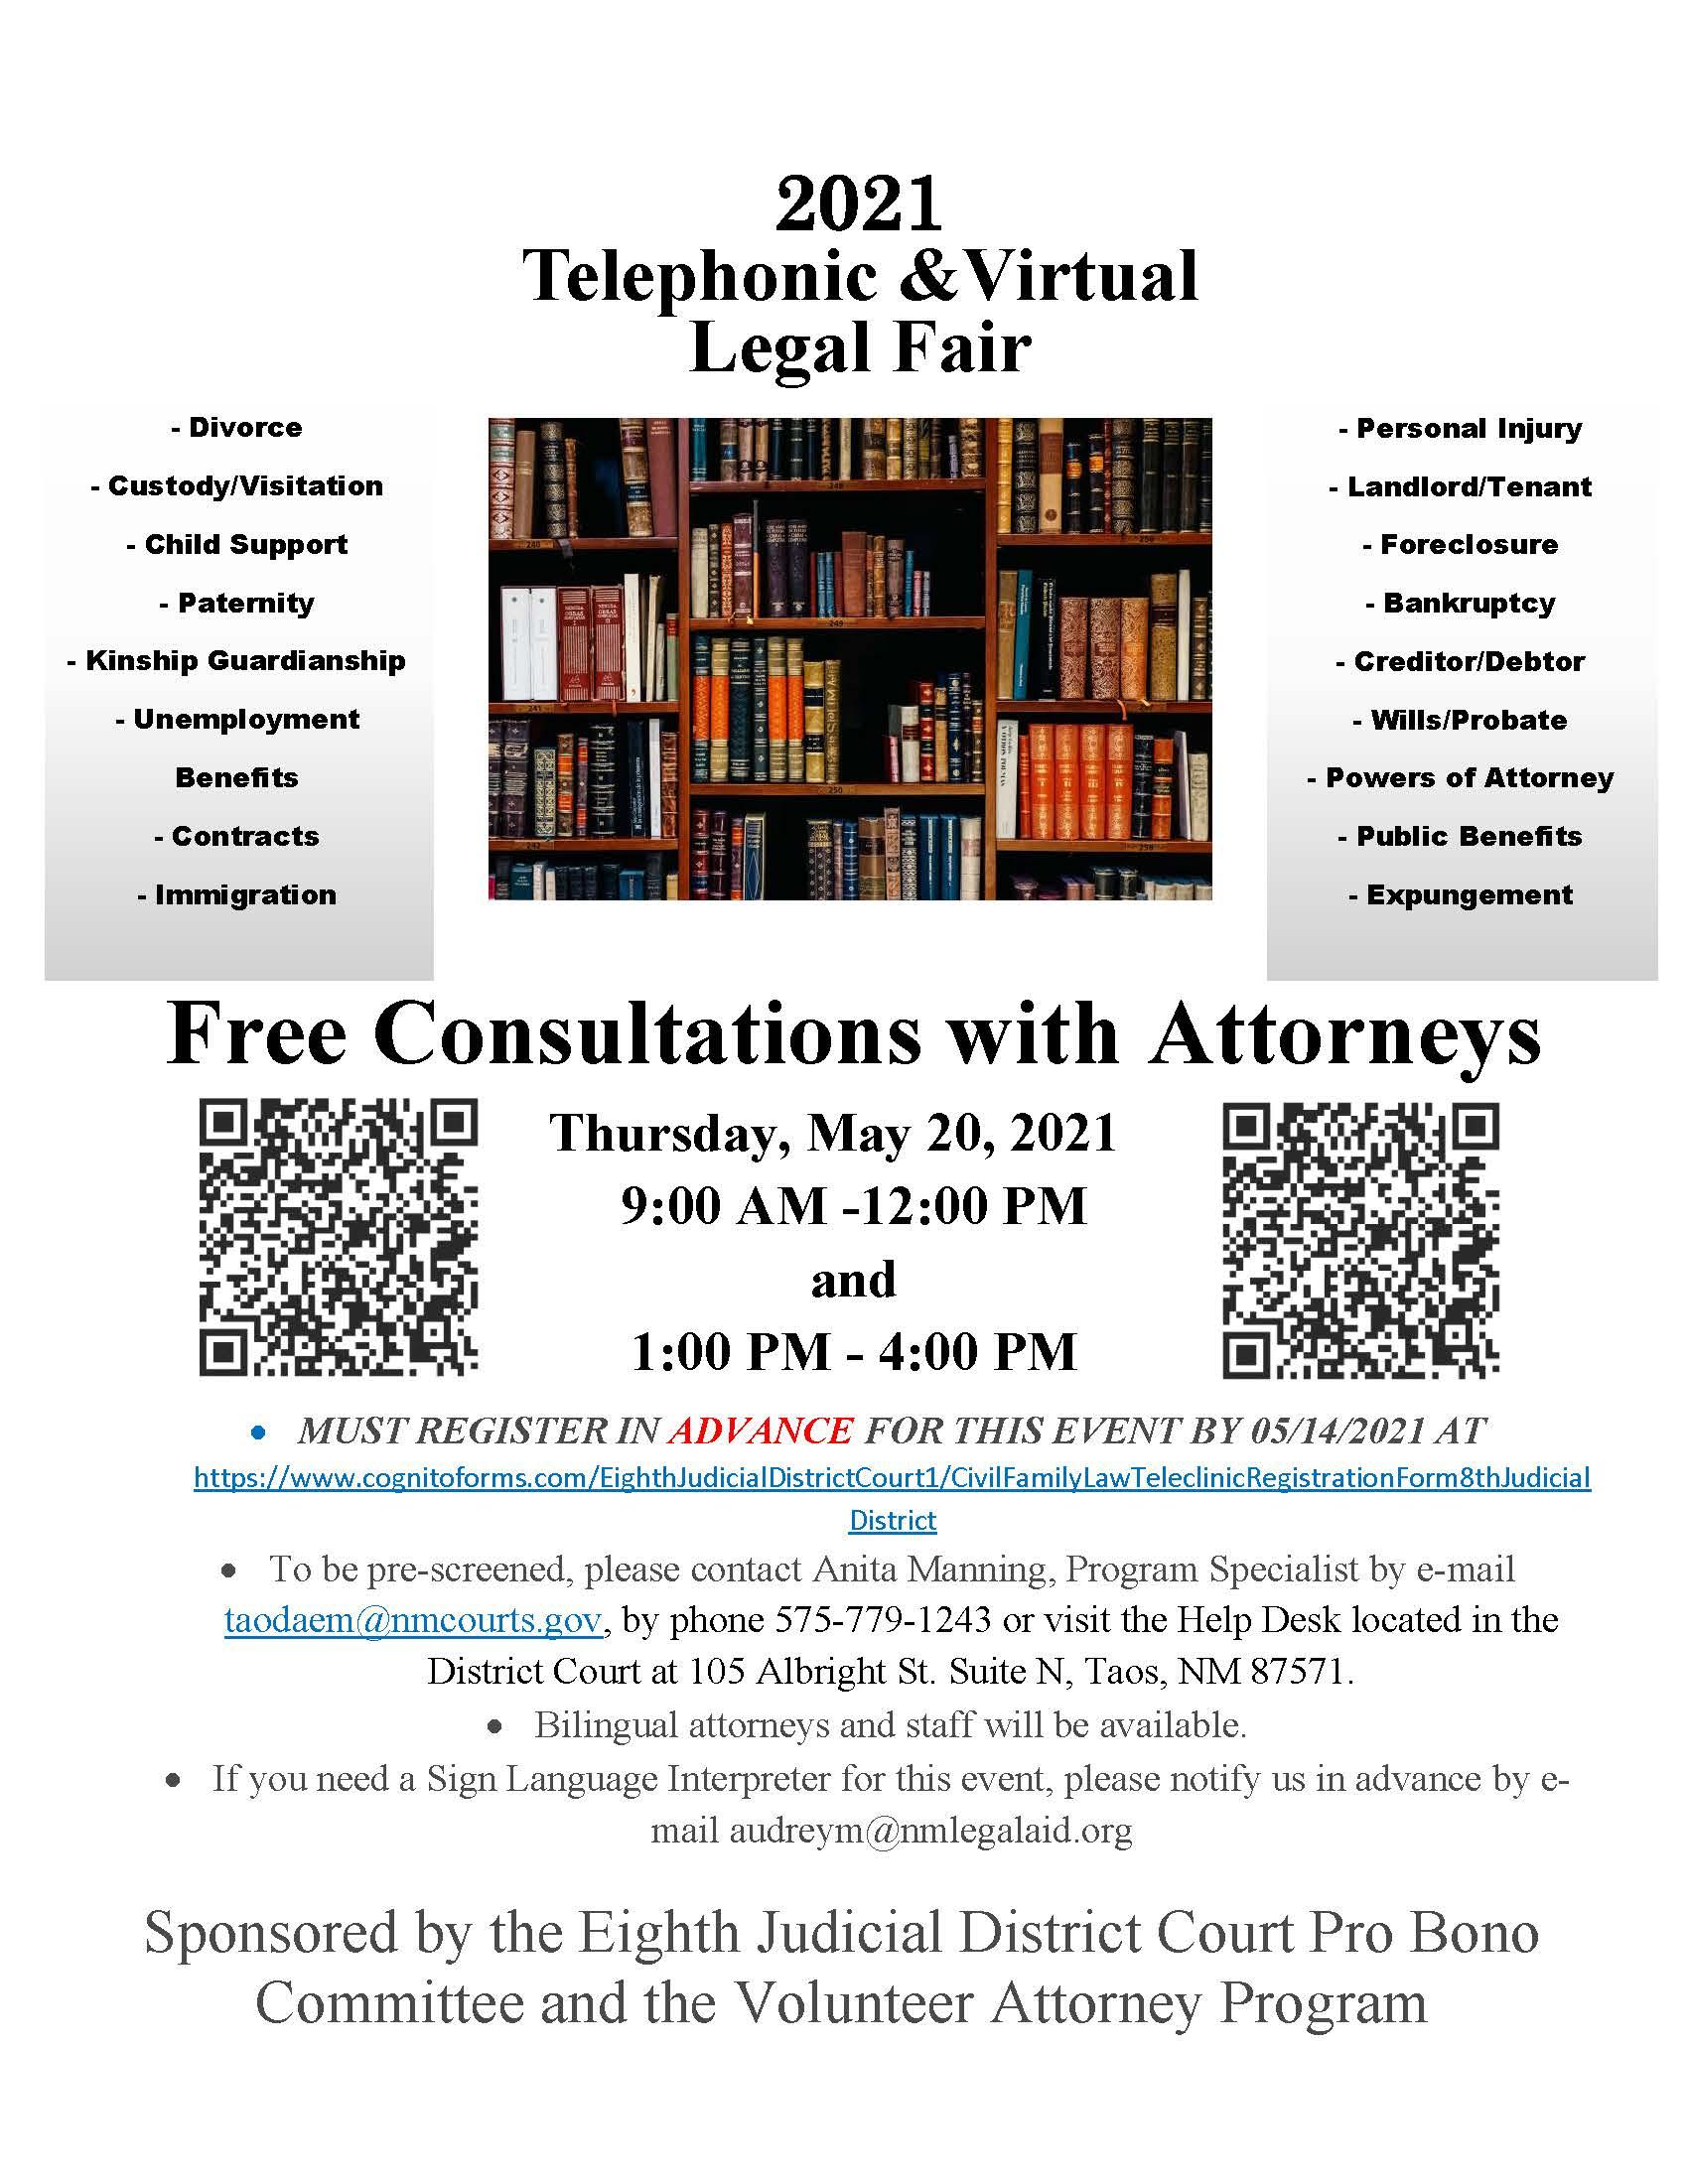 Taos Telephonic Virtual Free Legal Fair Flyer Page 1